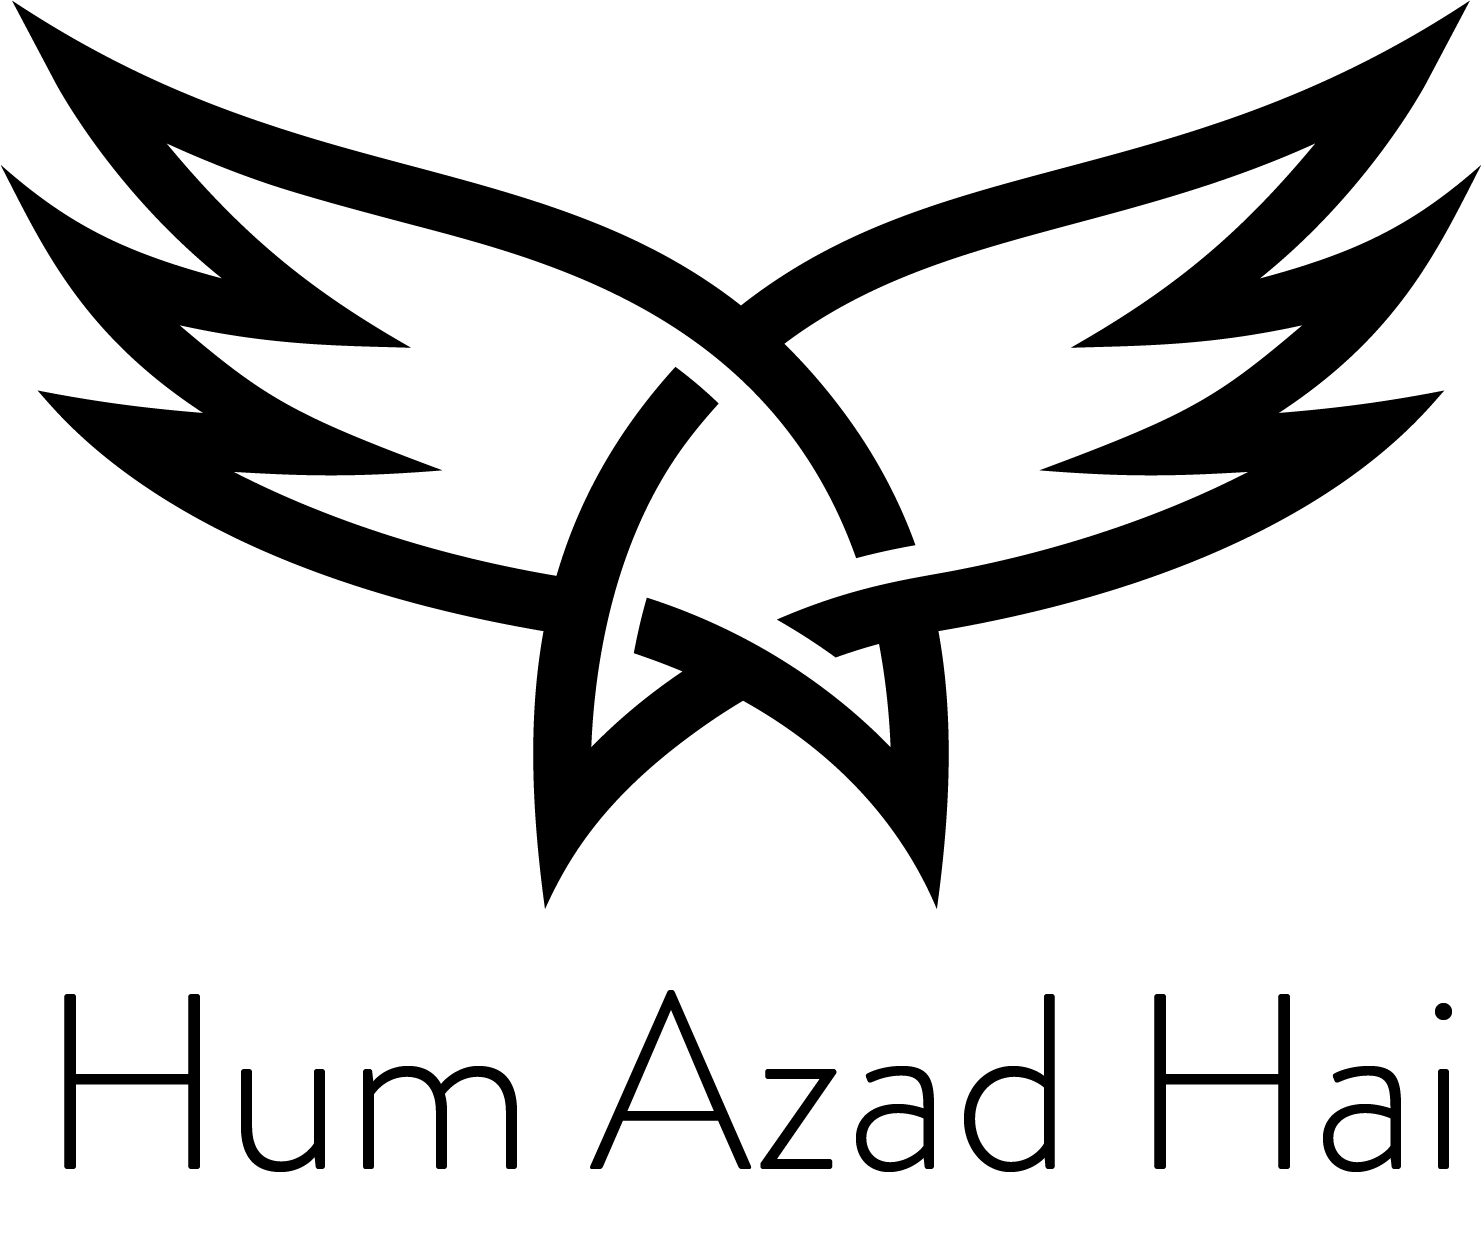 The old logo of Hum Azad Hai, a Welfare NGO based in Aurangabad